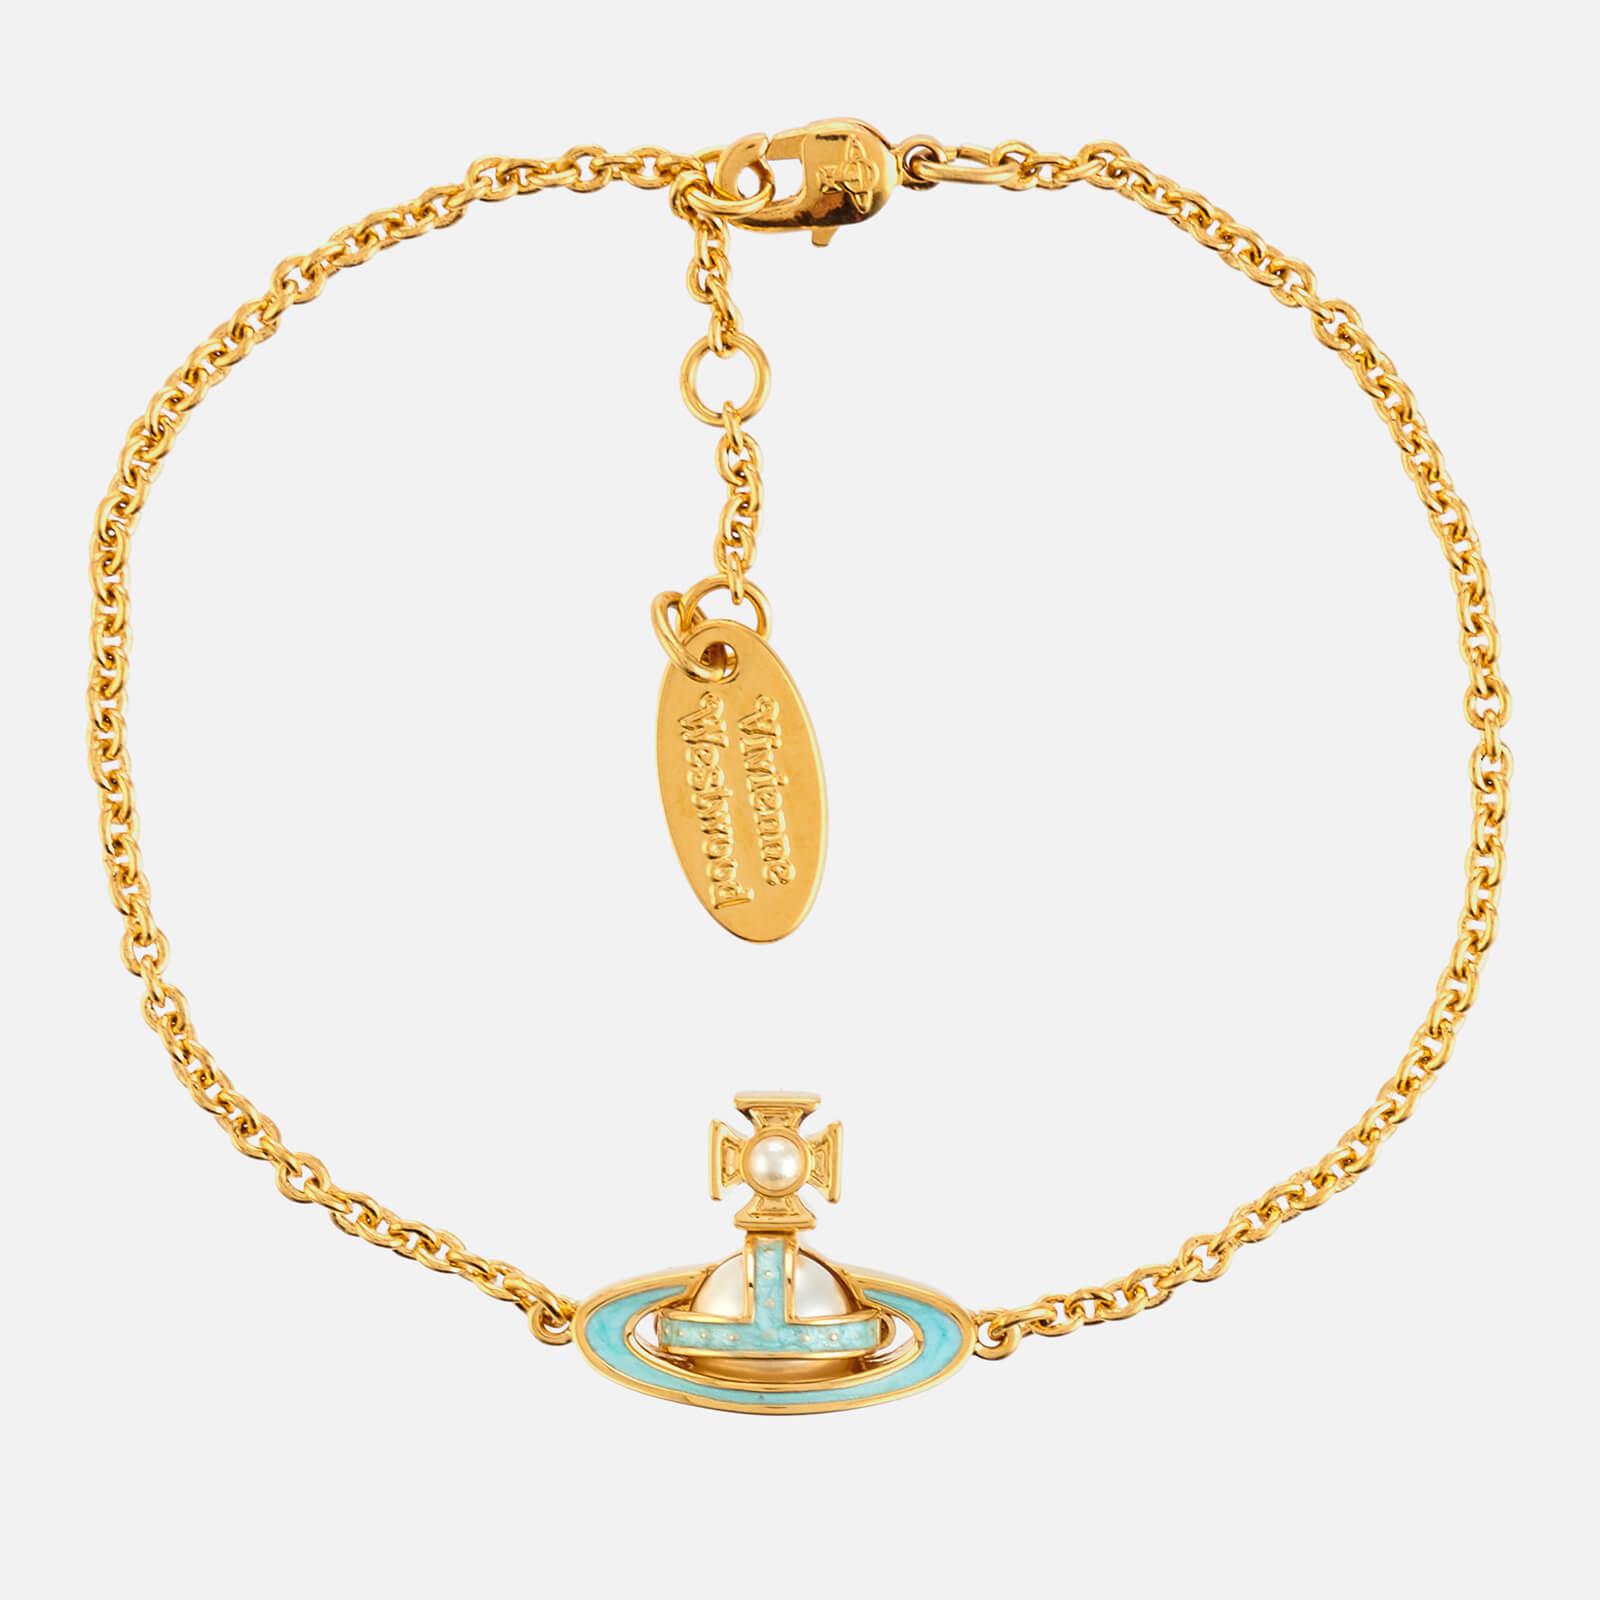 Vivienne Westwood Women's Simonetta Bas Relief Bracelet - Gold/Pearl/Blue